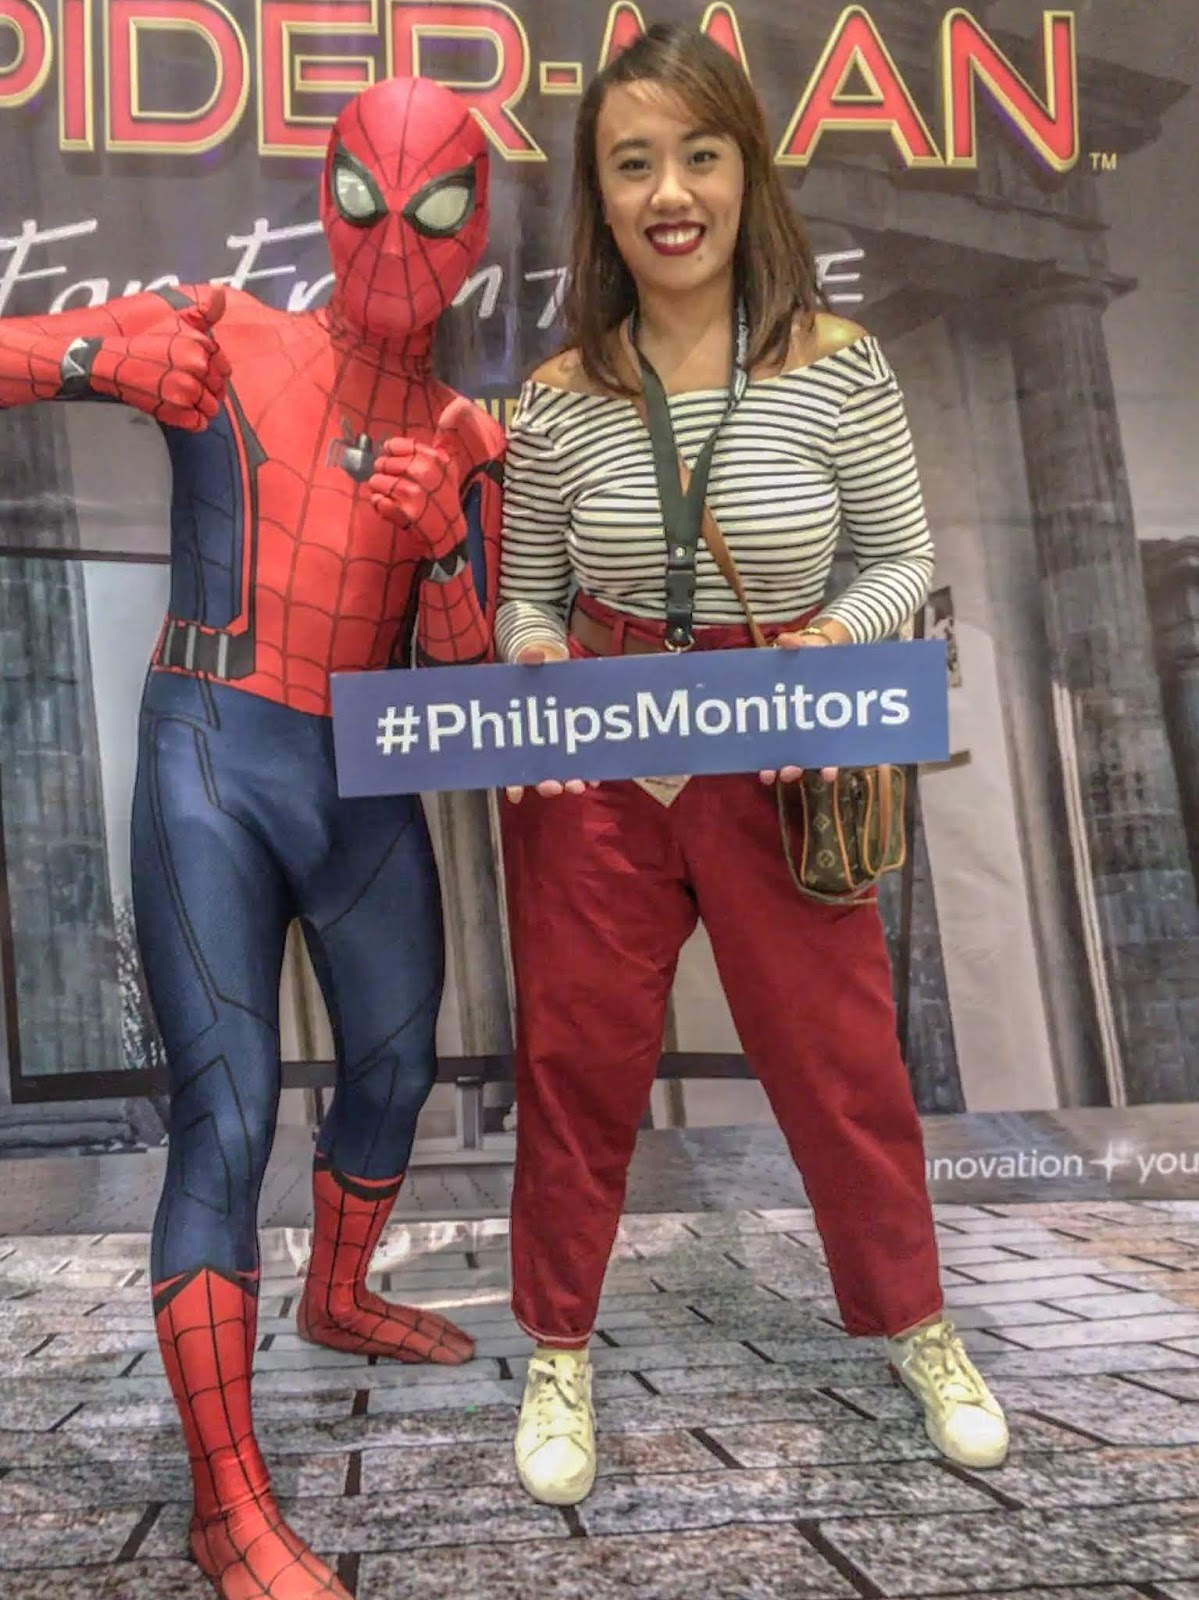 Spiderman Philips Monitor Cebu Fashion Blogger Pinkflushedcheeks